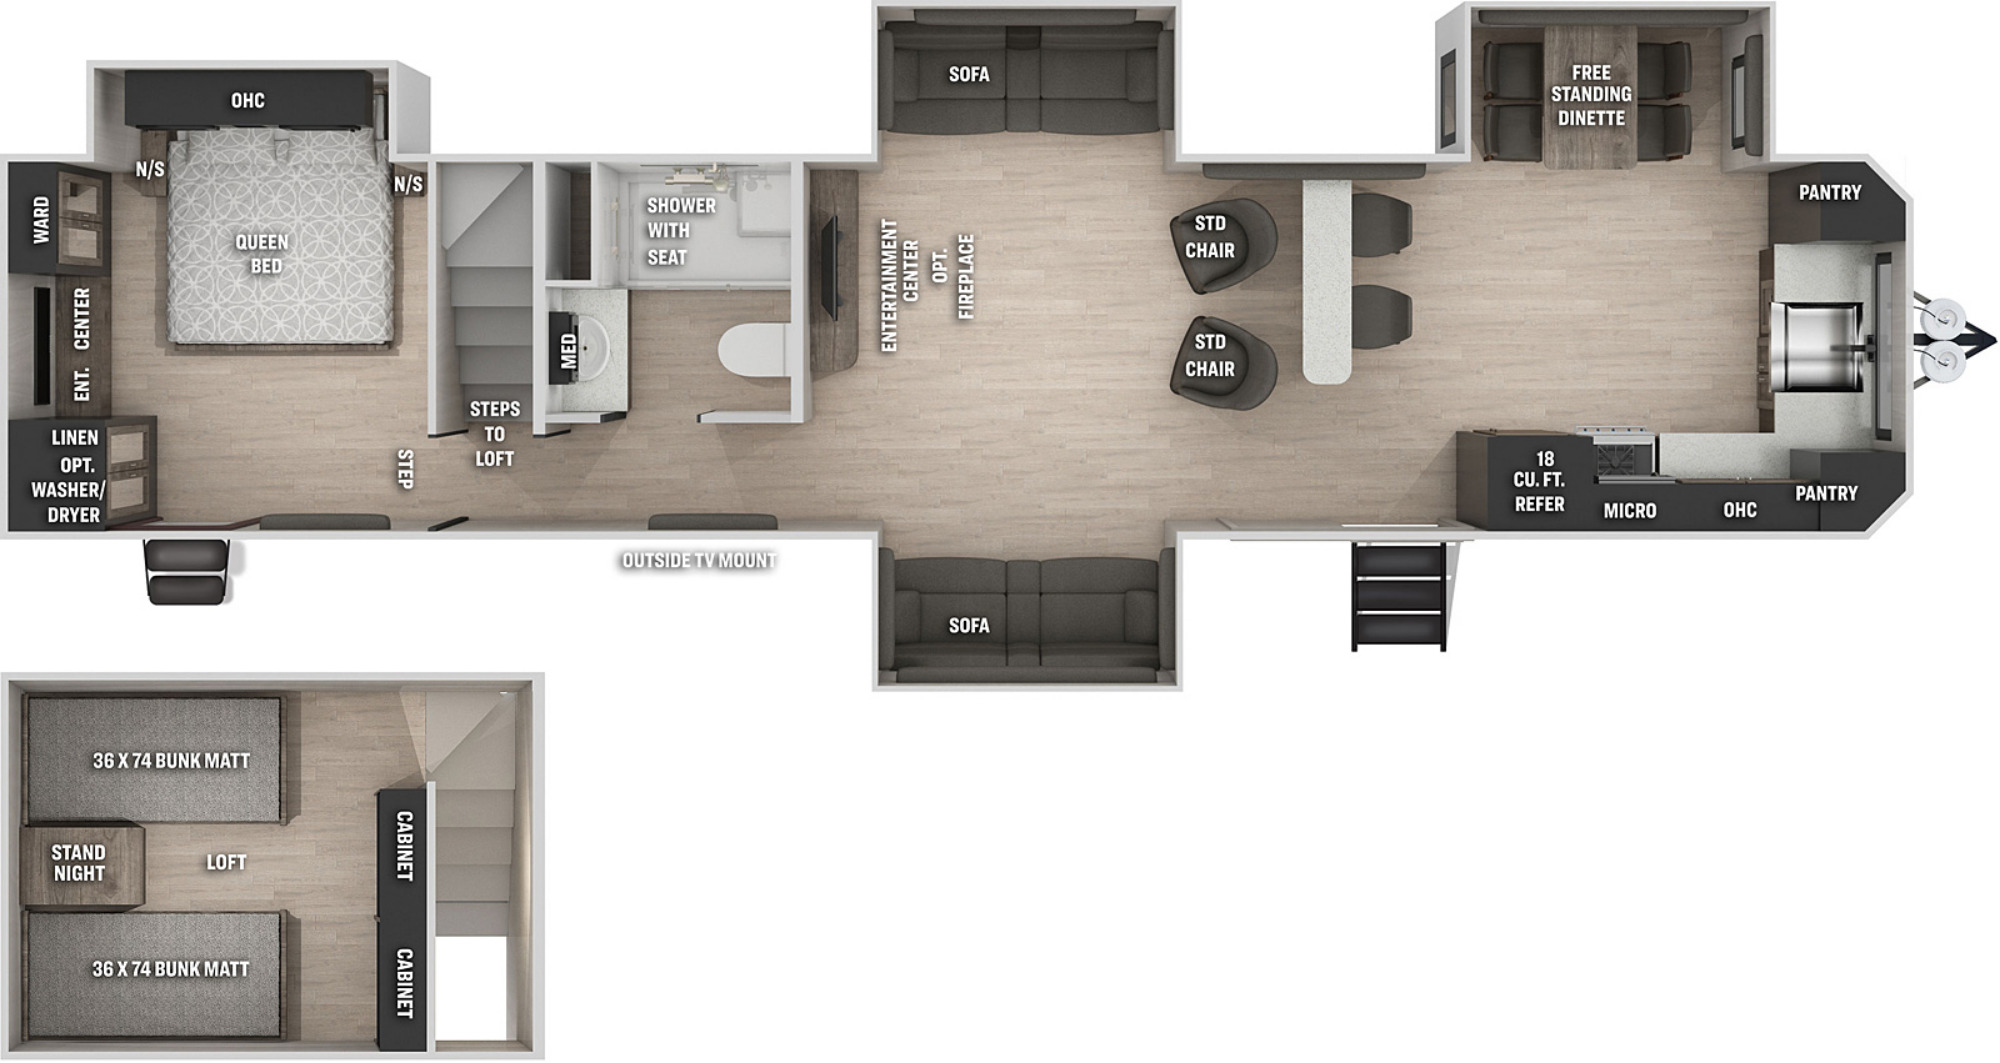 View Floor Plan for 2021 FOREST RIVER CHEROKEE BLACK LABEL 39SRBL